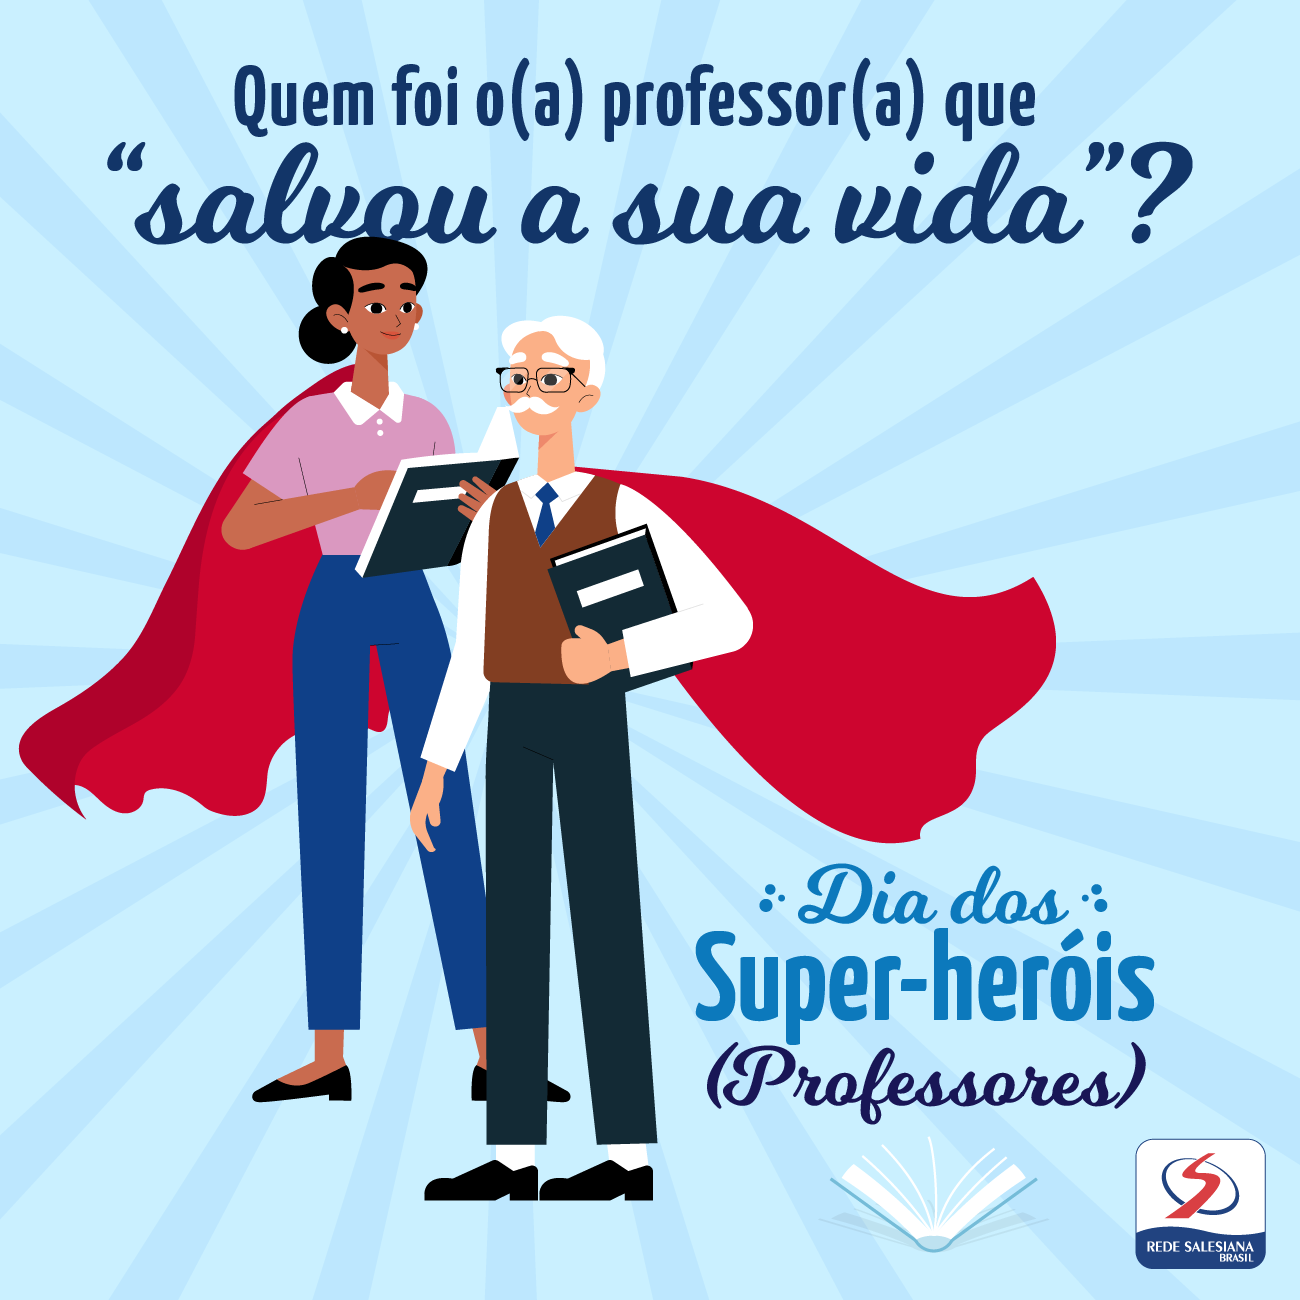 ✨Feliz dia dos professores!✨